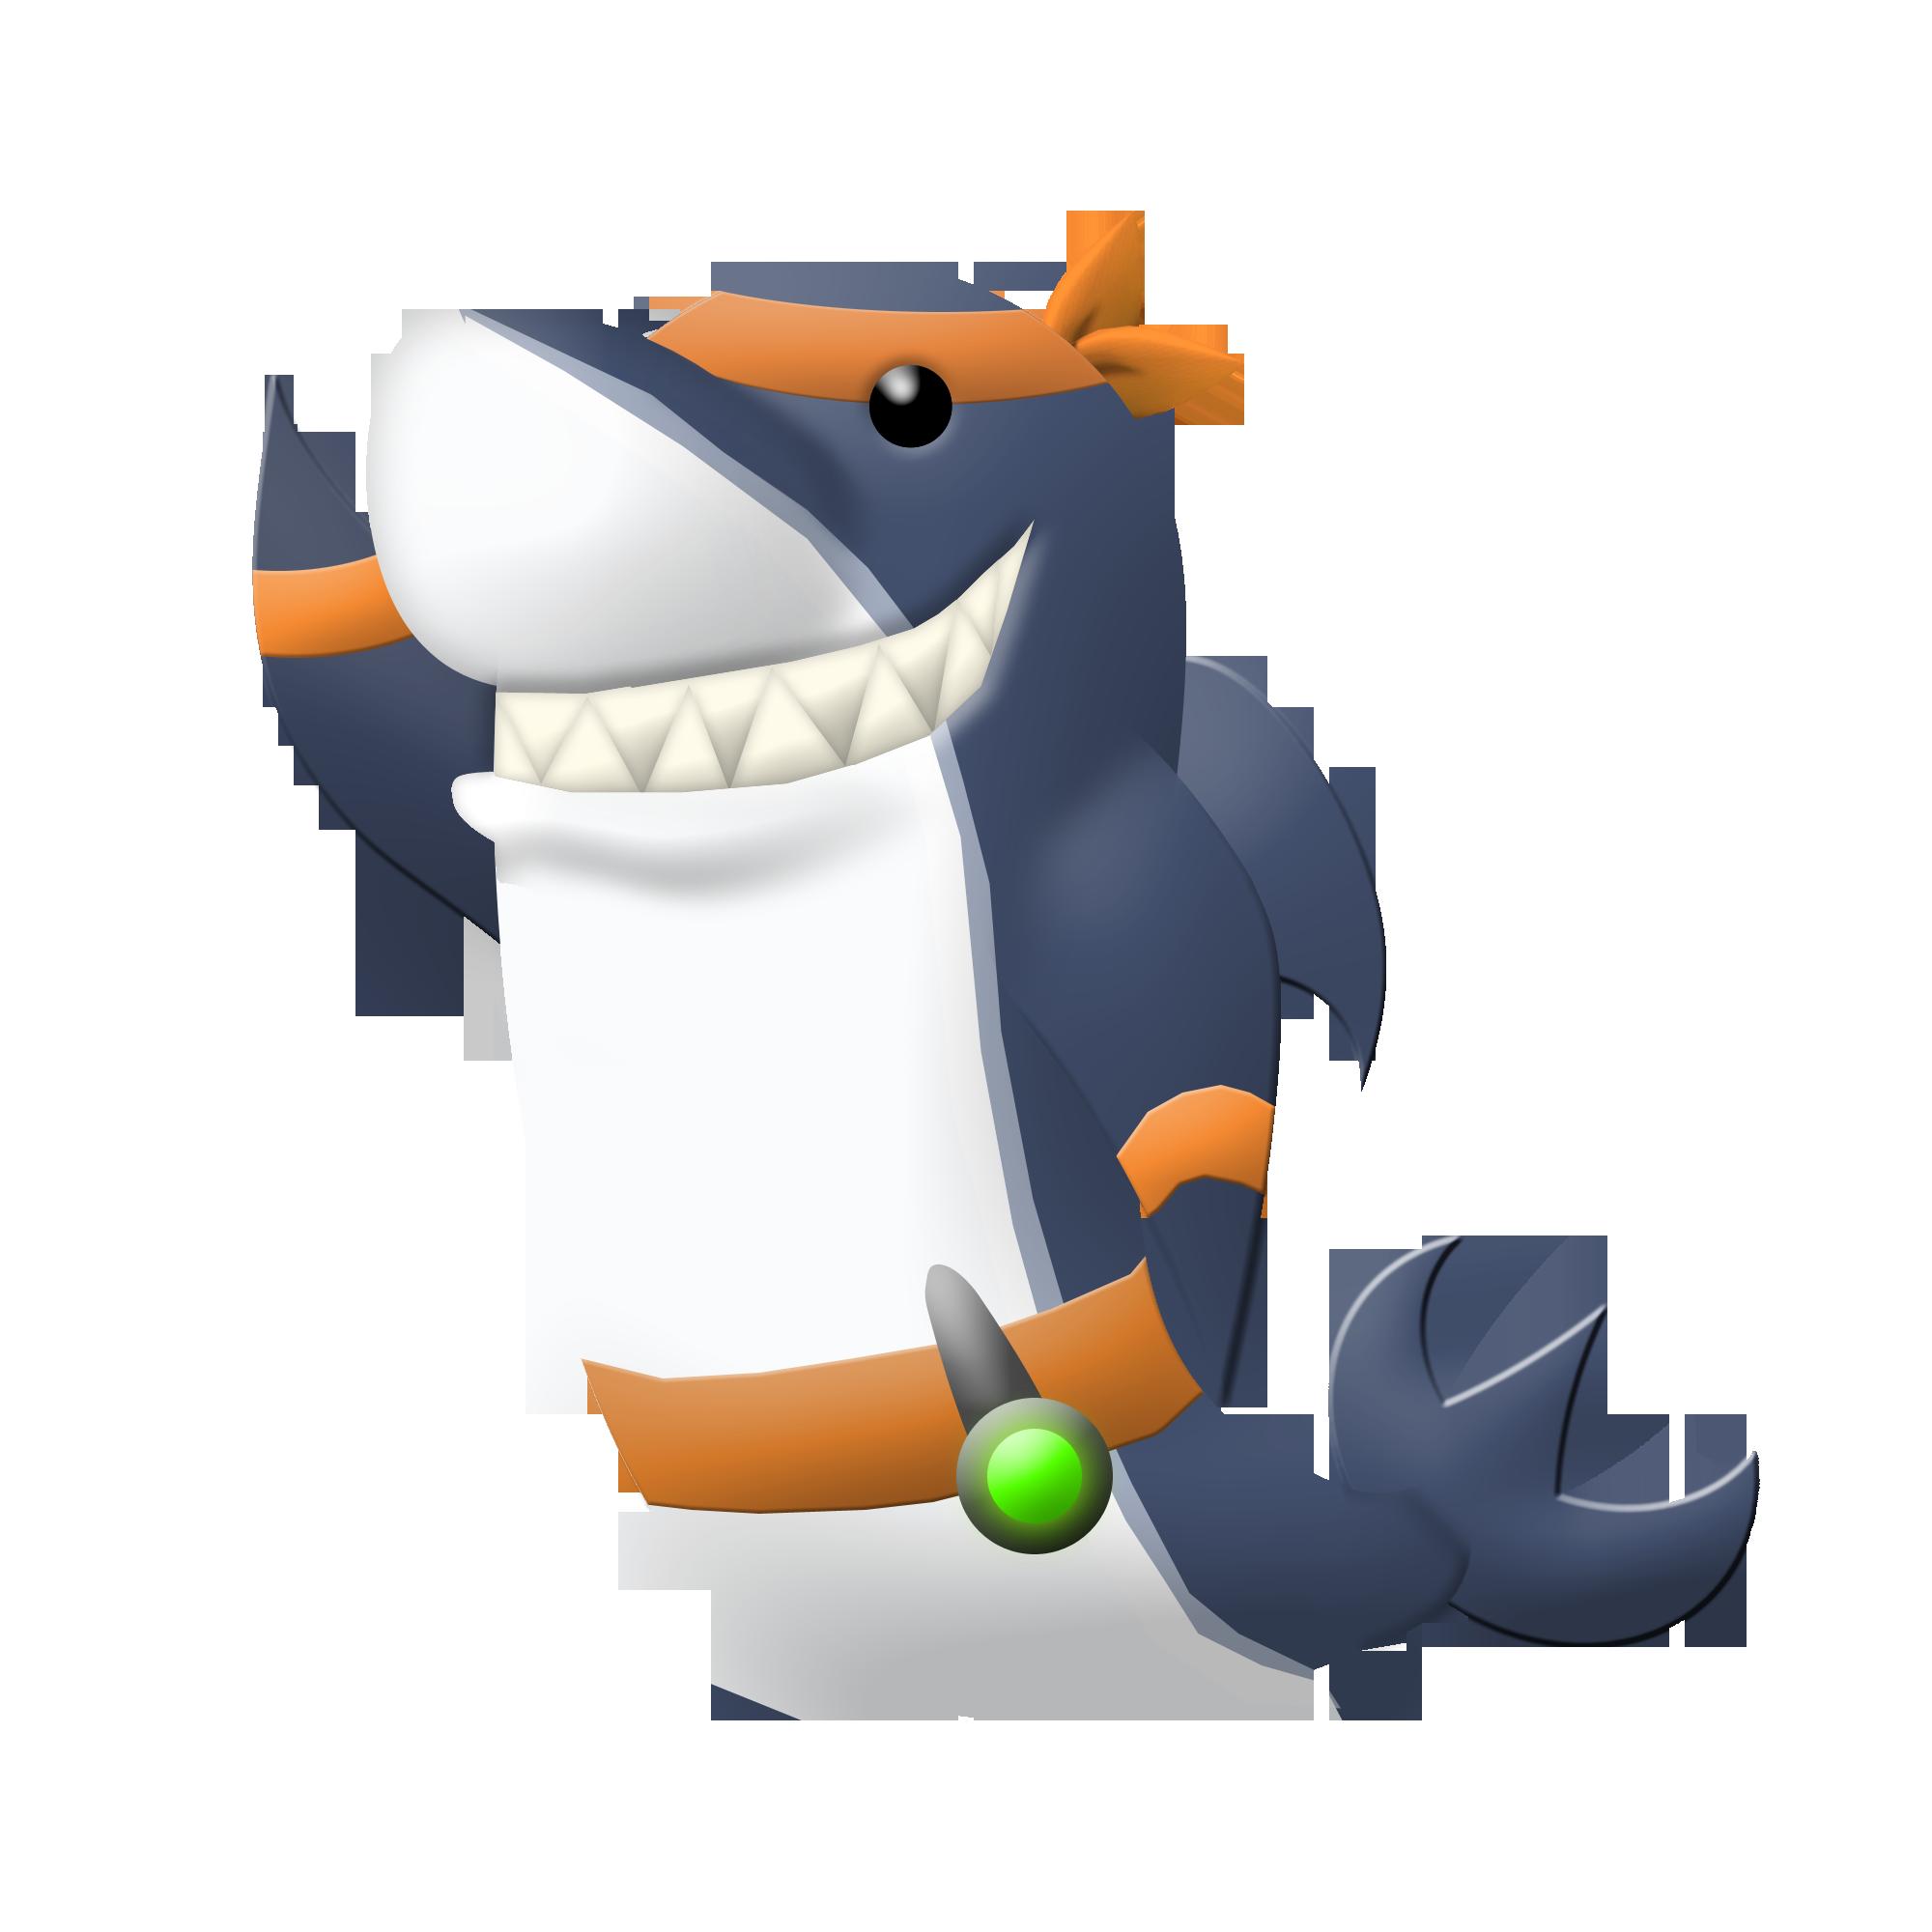 Guppy the Shark